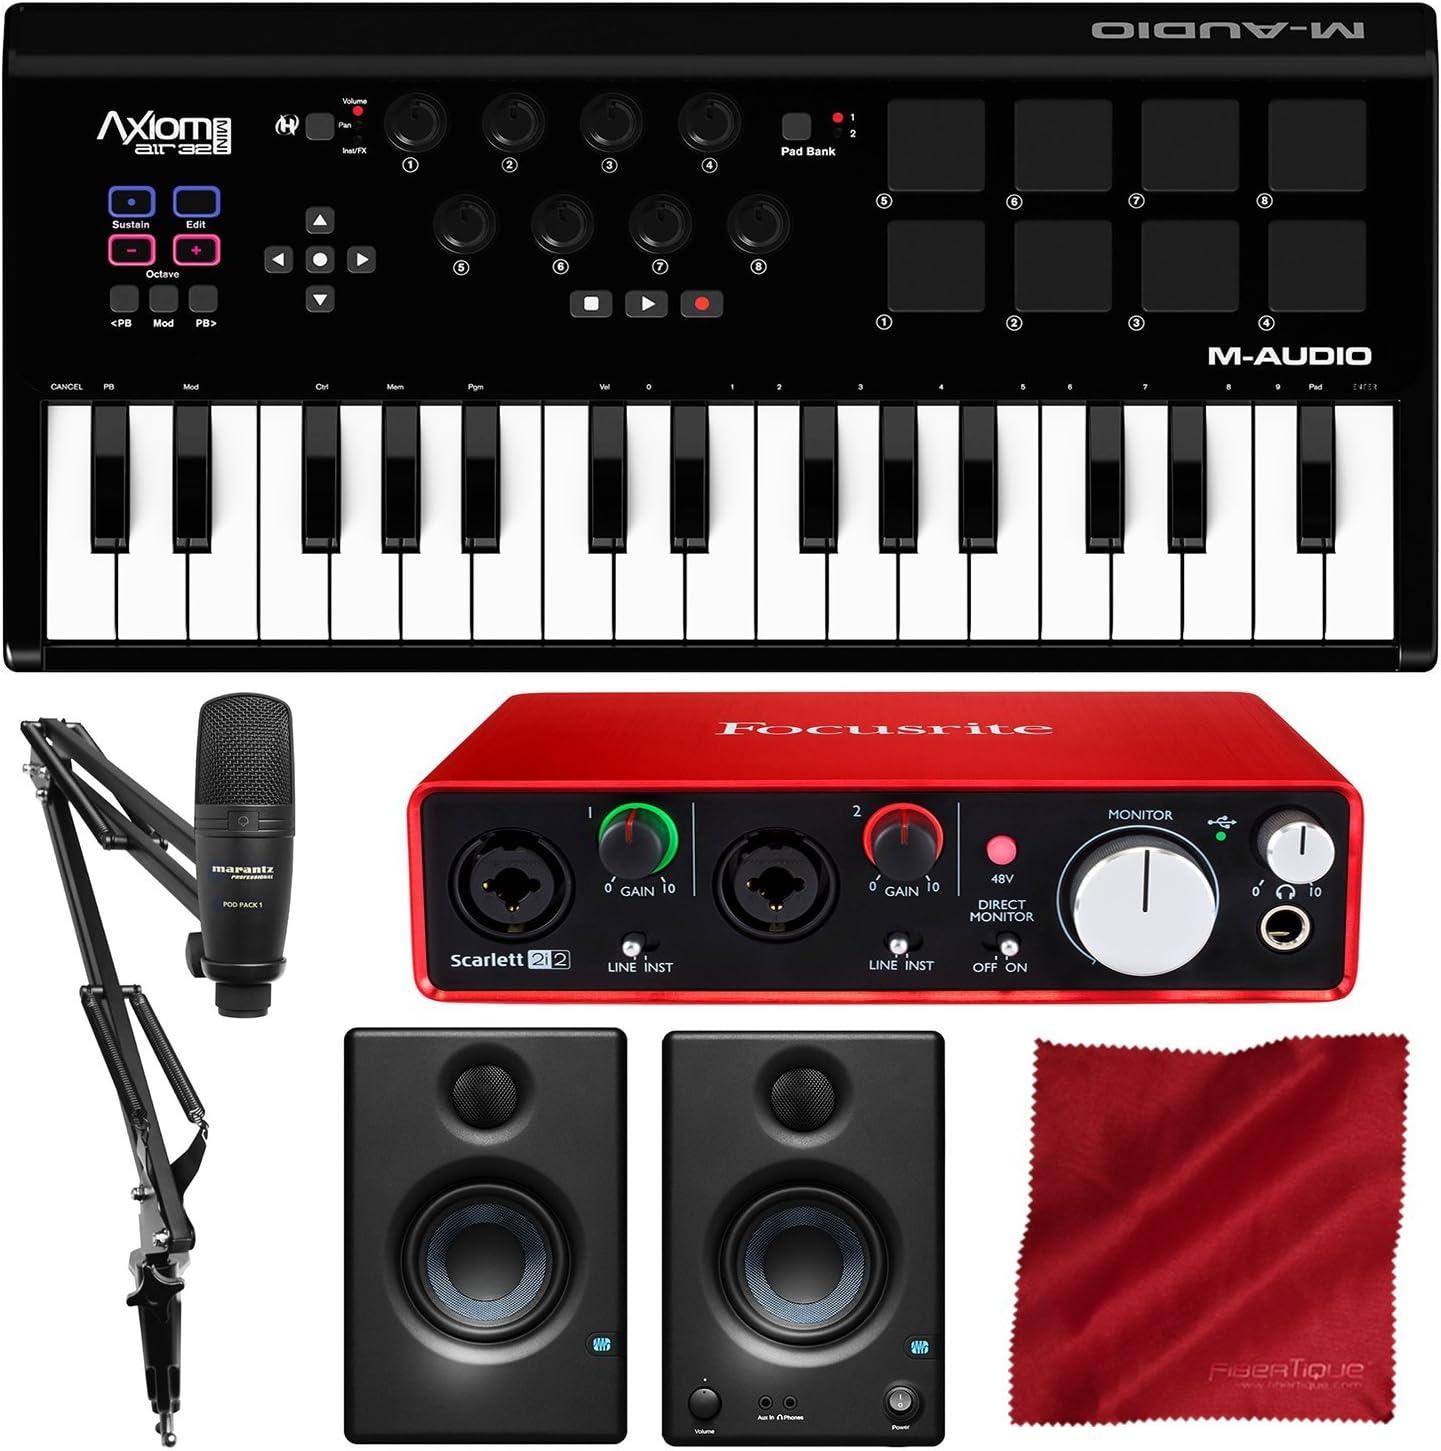 M-Audio Axiom Air Mini 32 USB MIDI teclado con Focusrite Scarlett 2i2 Interfaz de audio USB, Marantz Pod Pack 1 Kit de micrófono USB, y Premium Bundle: Amazon.es: Instrumentos musicales